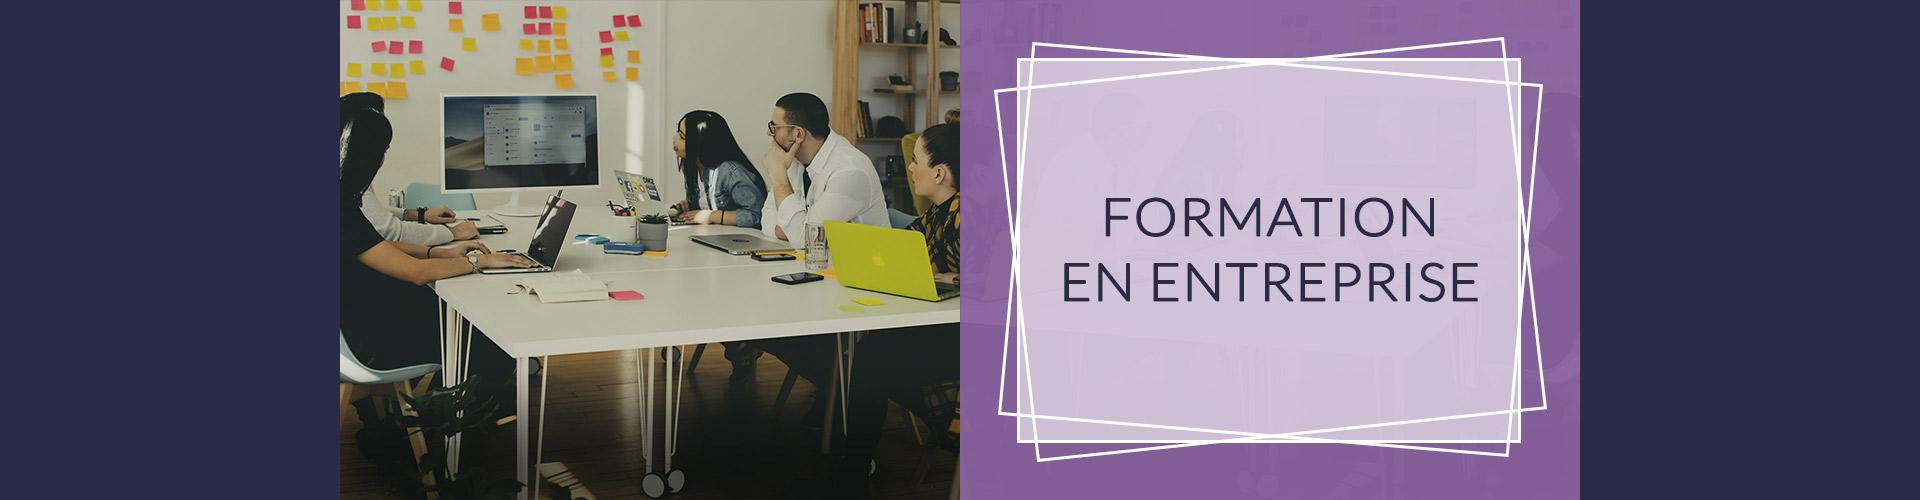 Formation en entreprise par Verso Coaching International